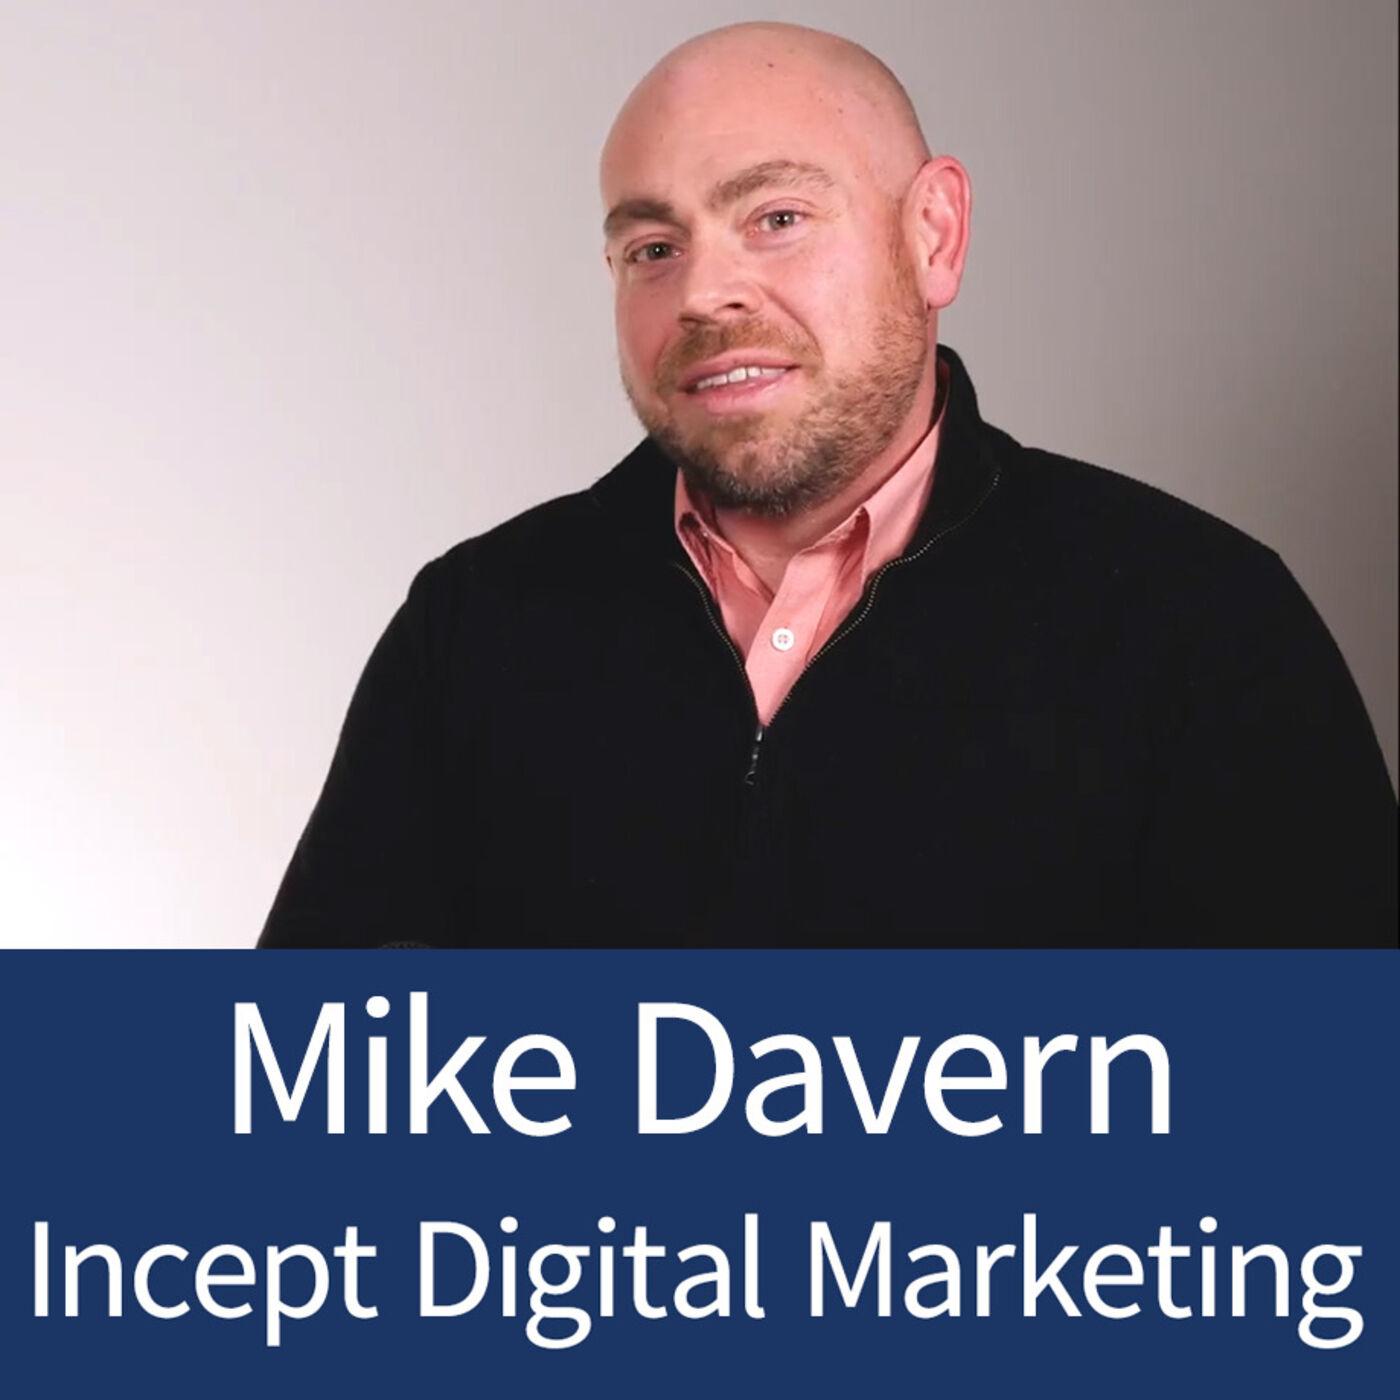 Mike Davern - Incept Digital Marketing - Episode 14